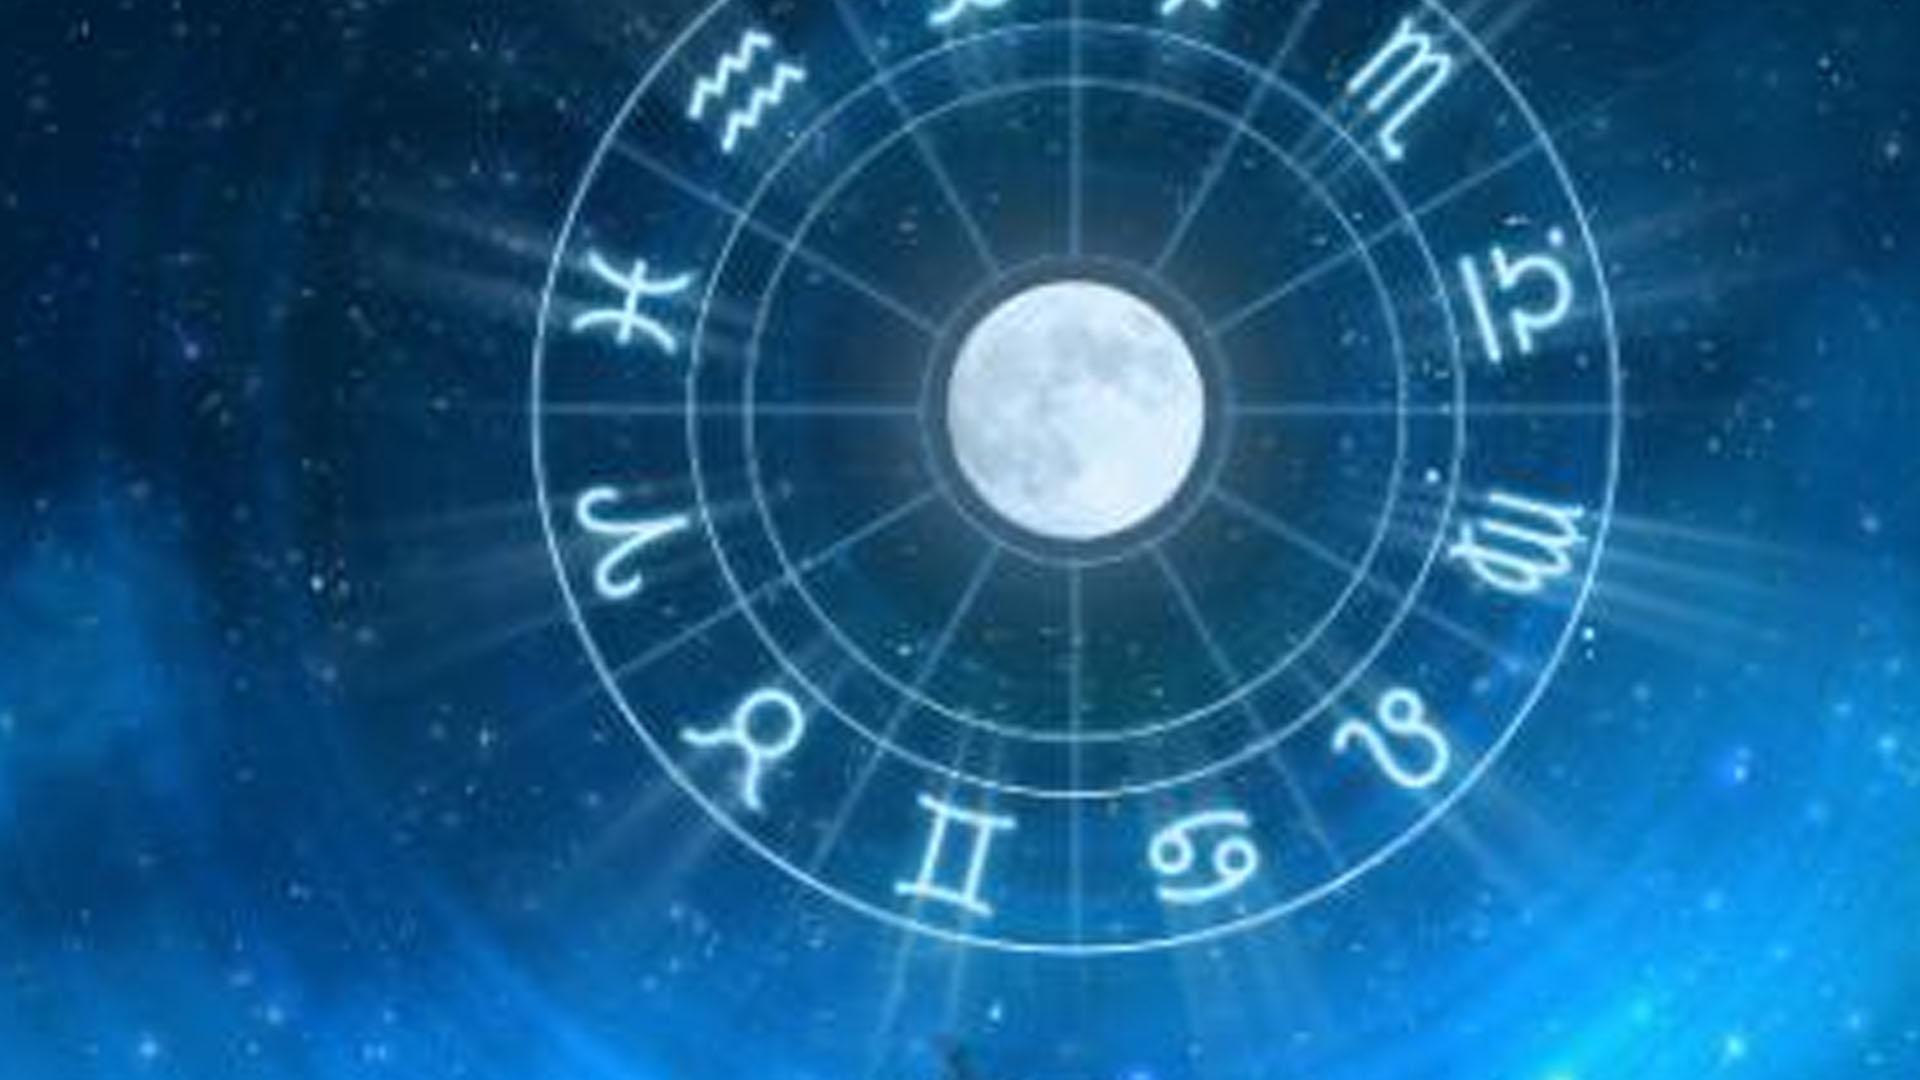 Como cada signo do zodíaco reage no amor